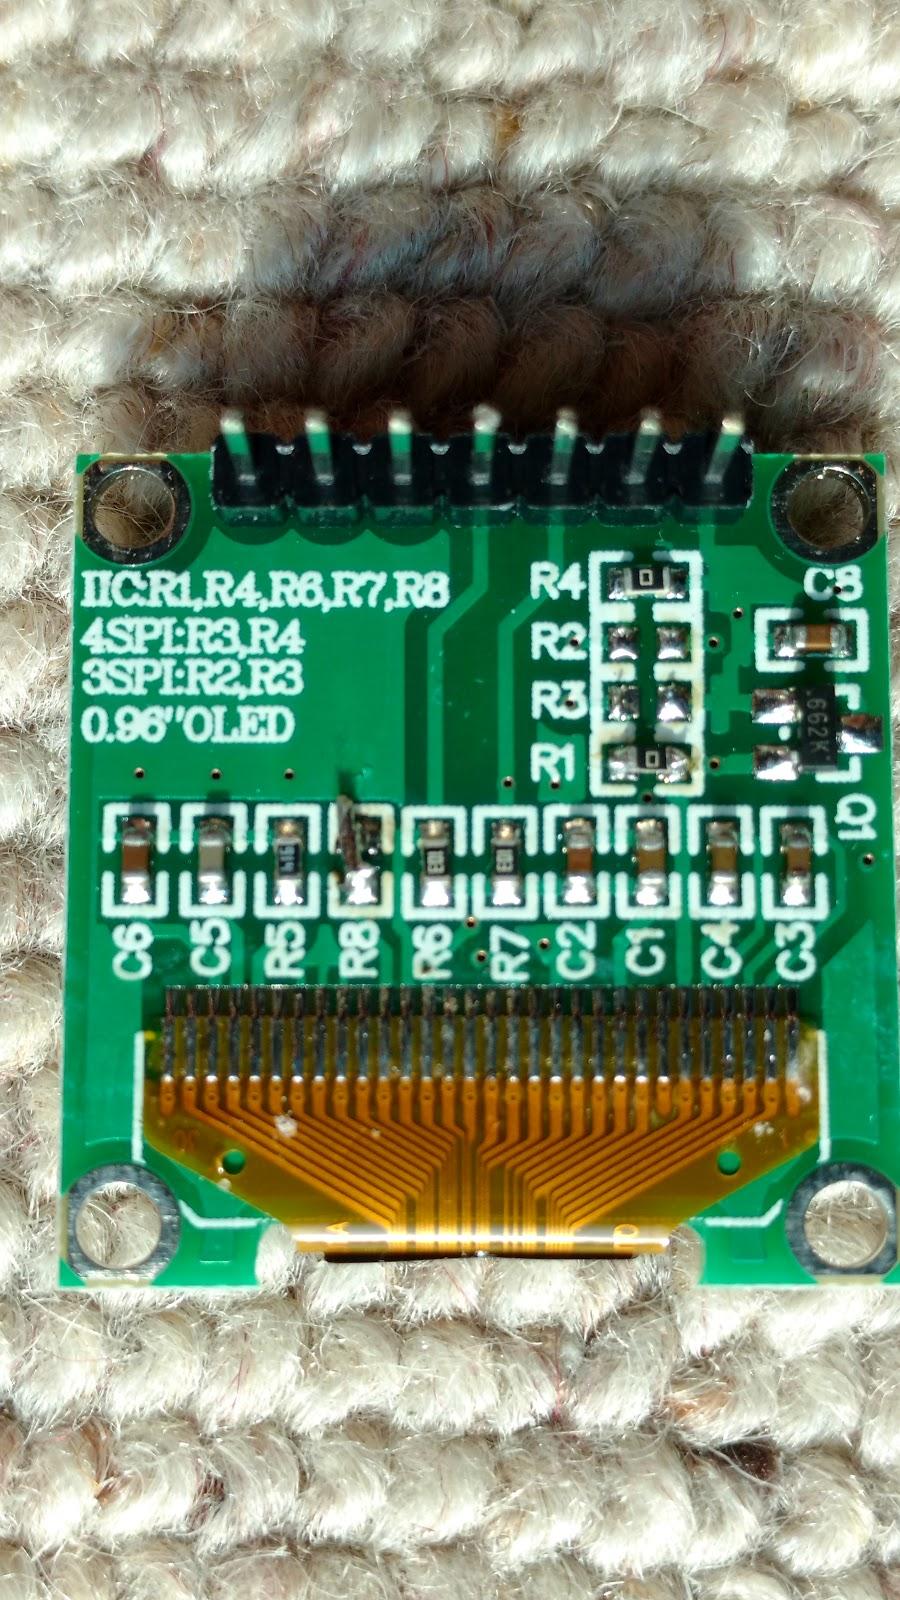 Tagebuch: Drive SSD1306 OLED with I2C on ESP8266 Wemos D1 mini